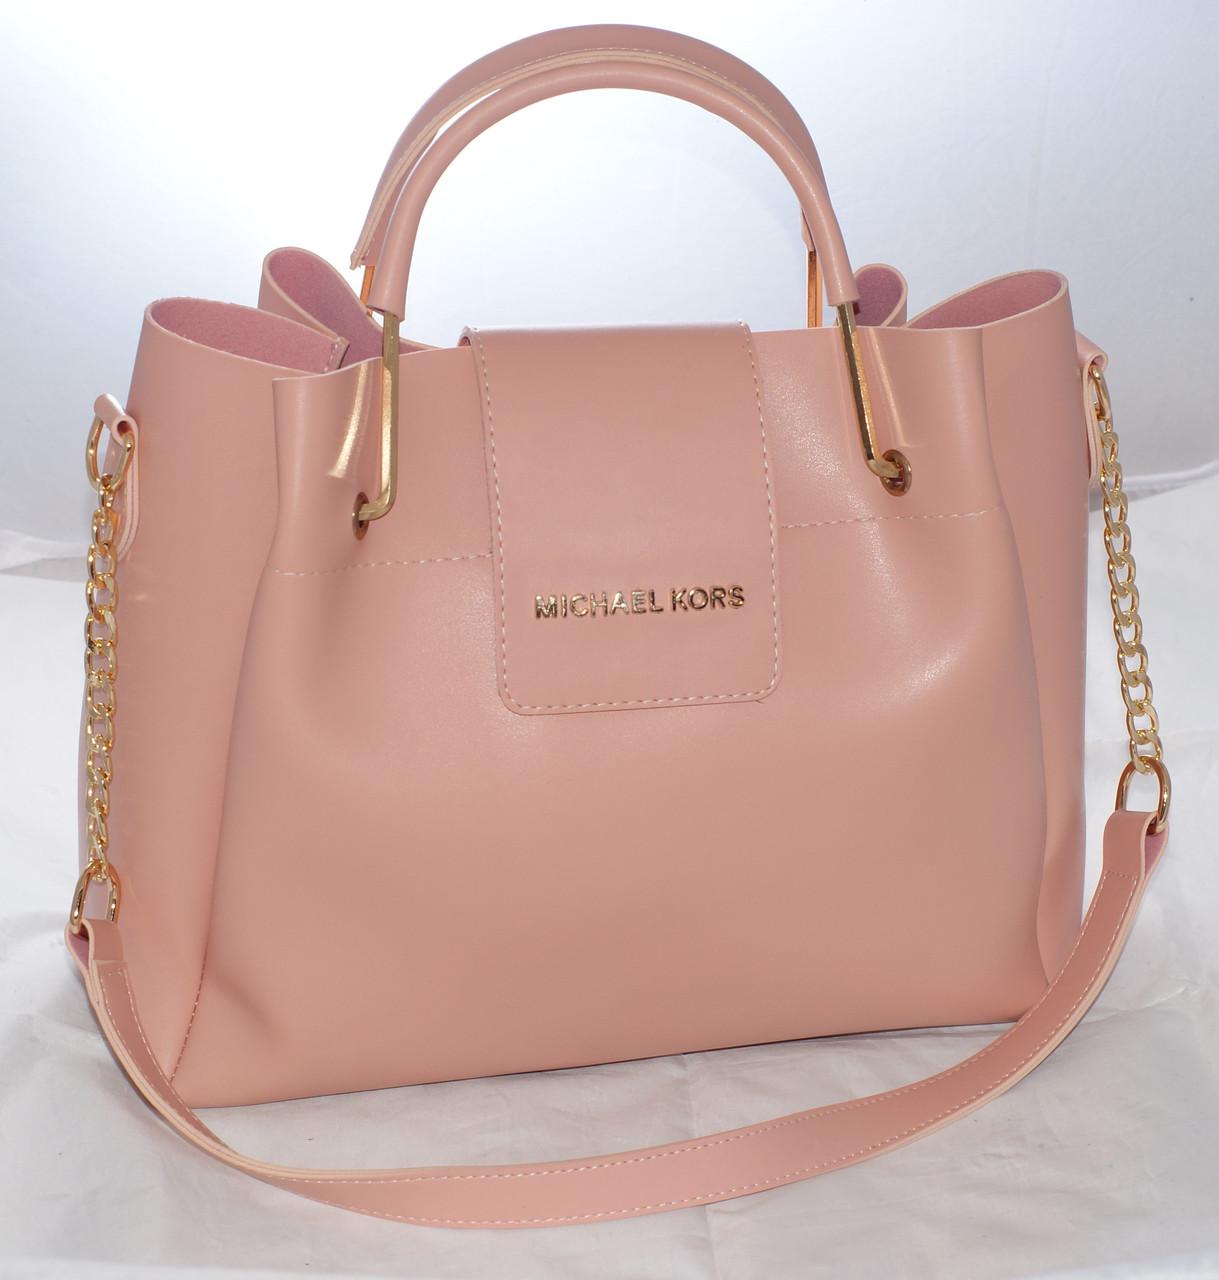 2e0be1e4d2e5 Женская сумка Michael Kors (Майкл Корс), розовая  продажа, цена в ...